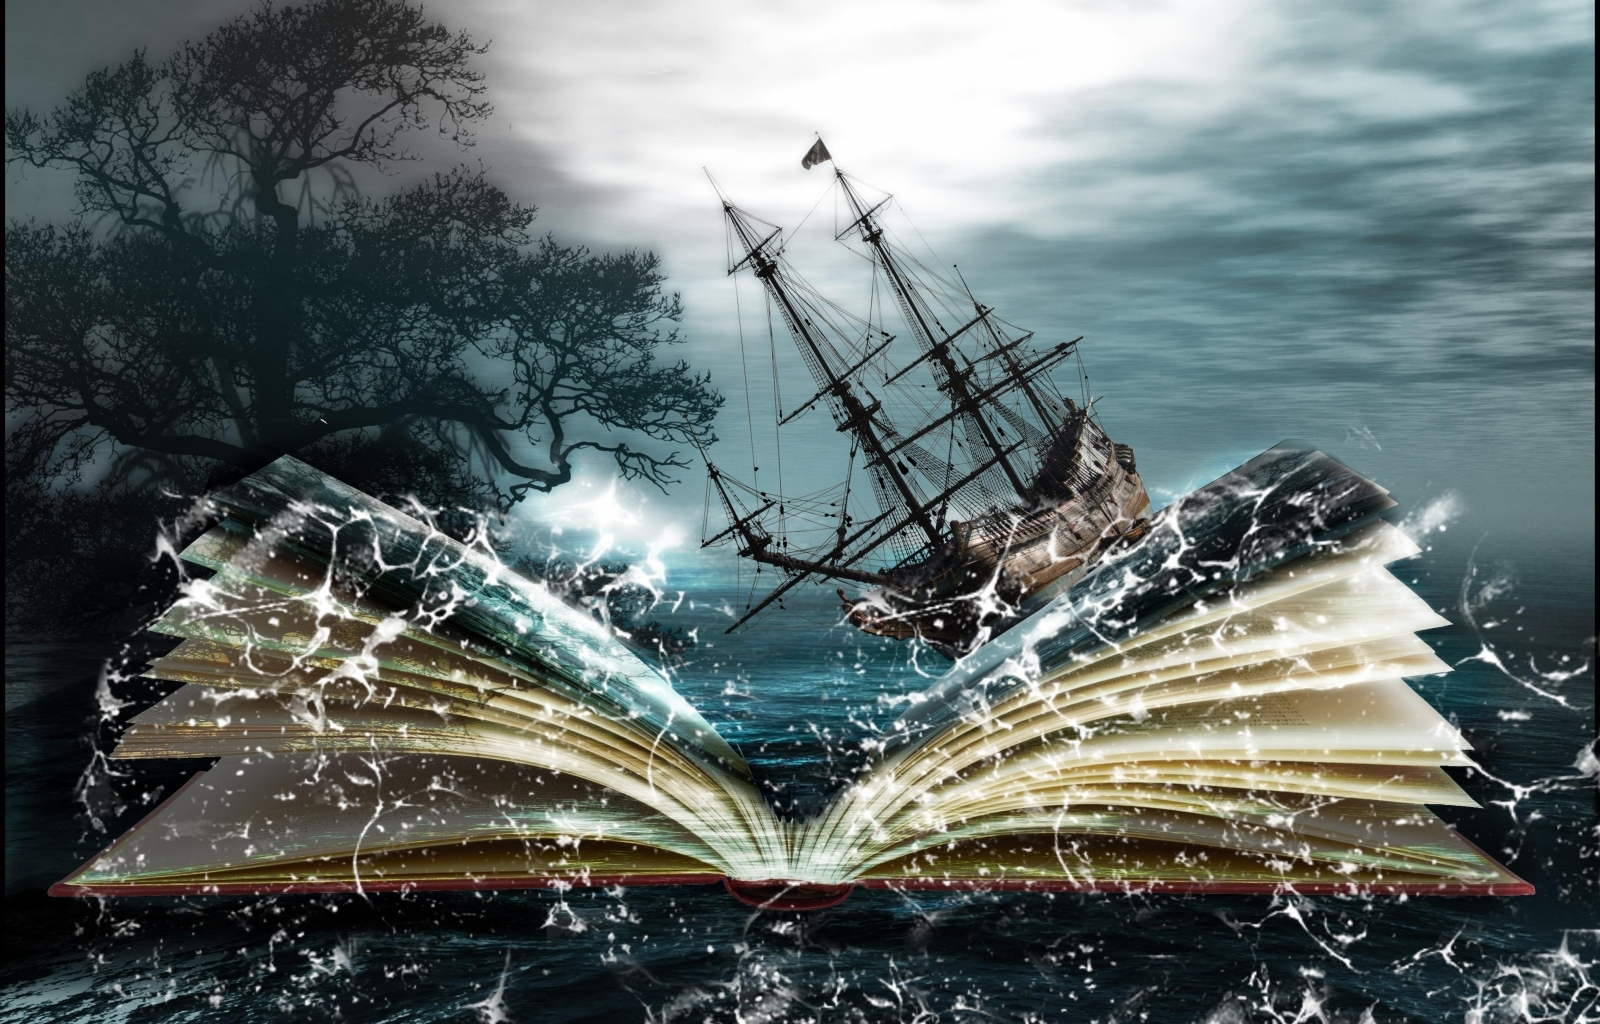 29188 скачать обои Корабли, Фэнтези, Море, Артфото - заставки и картинки бесплатно